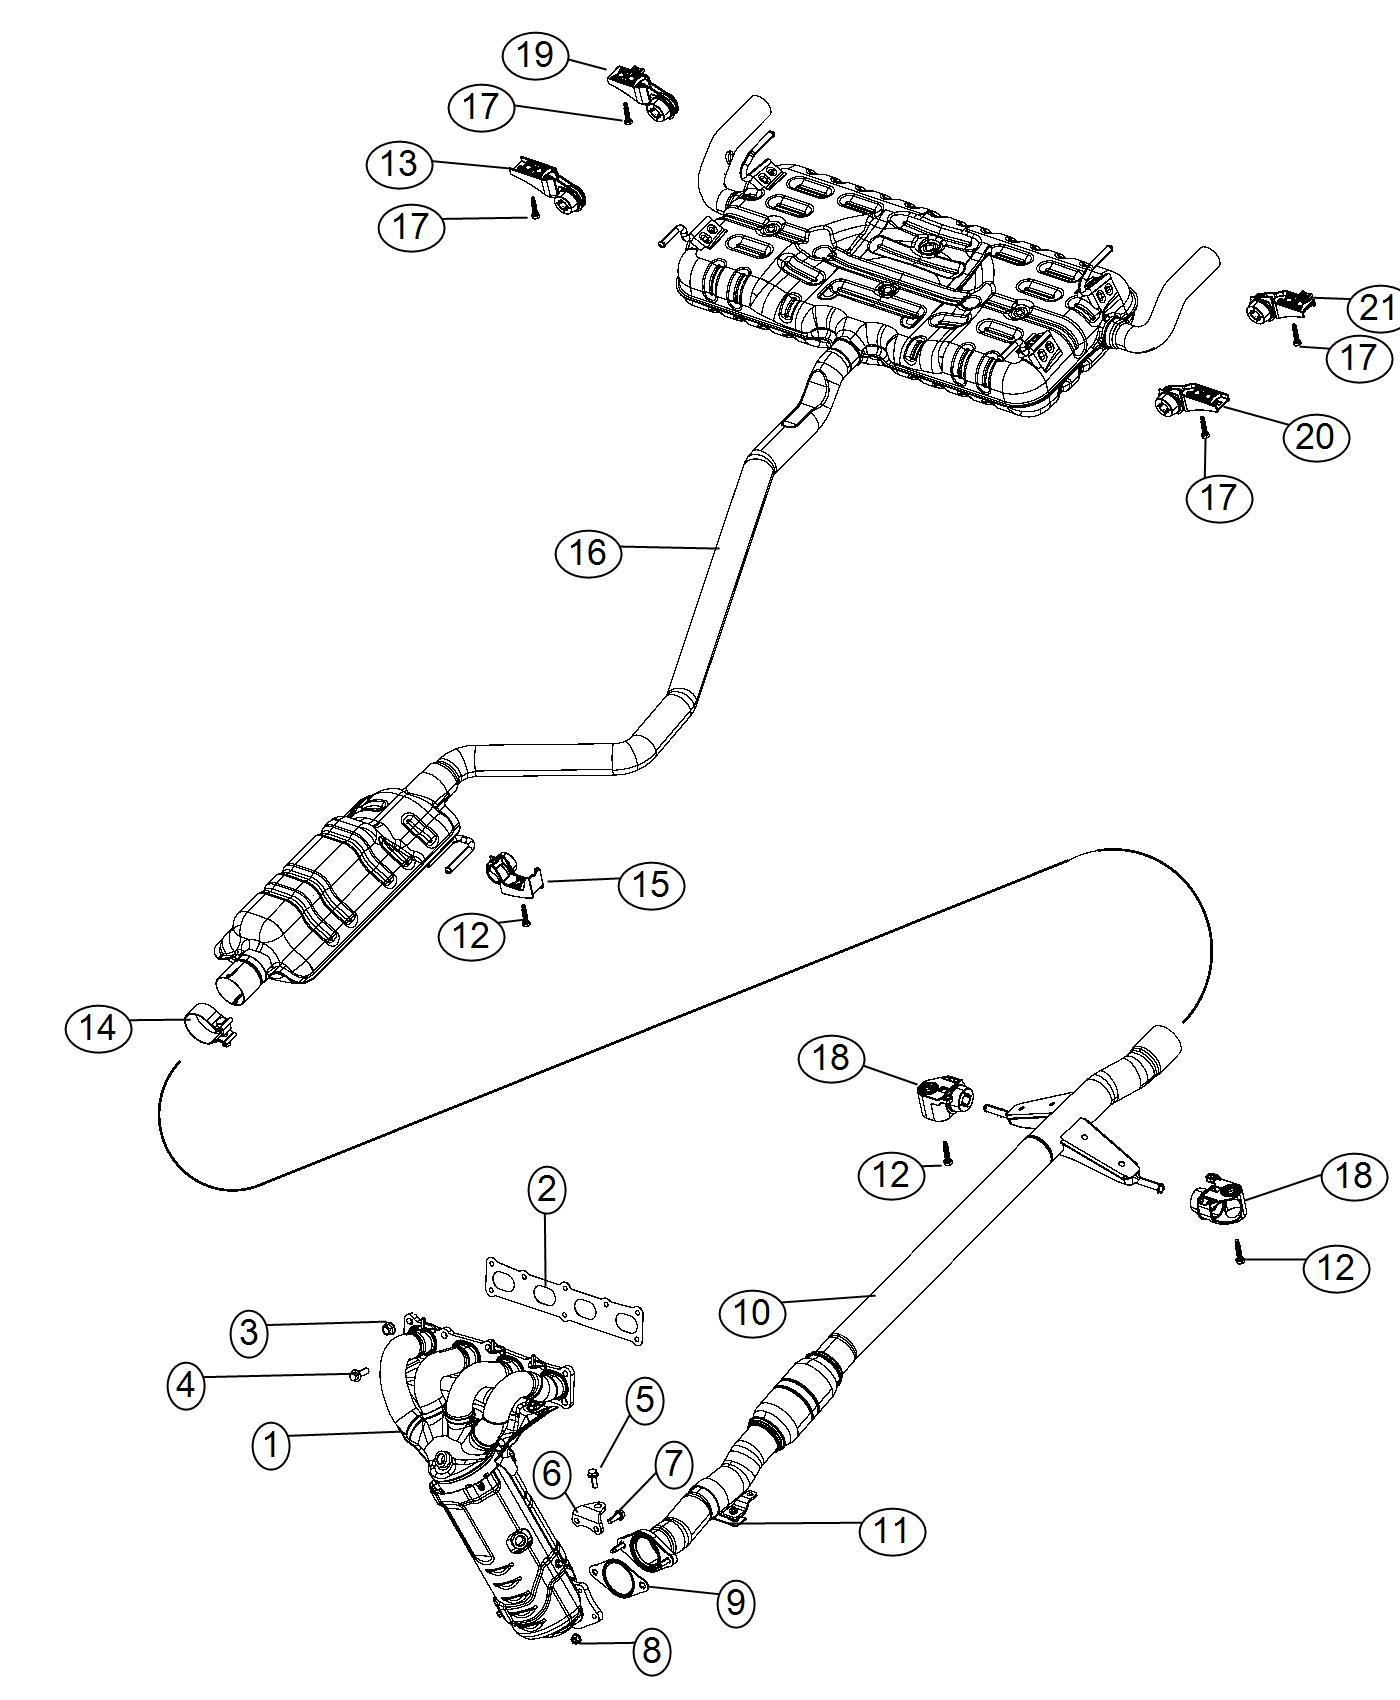 Chrysler 200 Pipe Exhaust